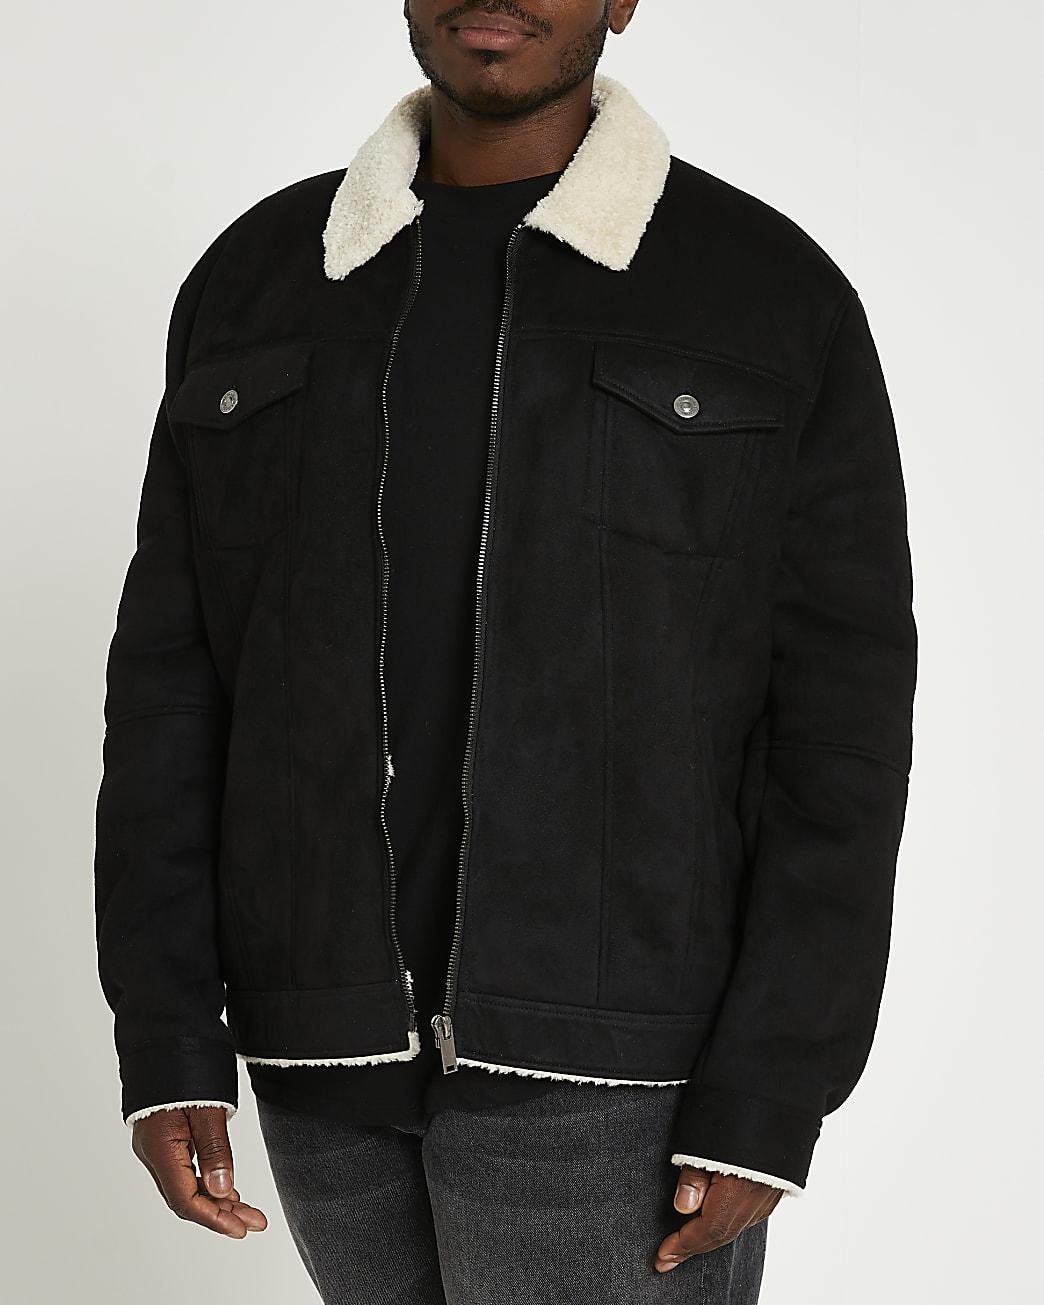 Big & tall black collared jacket